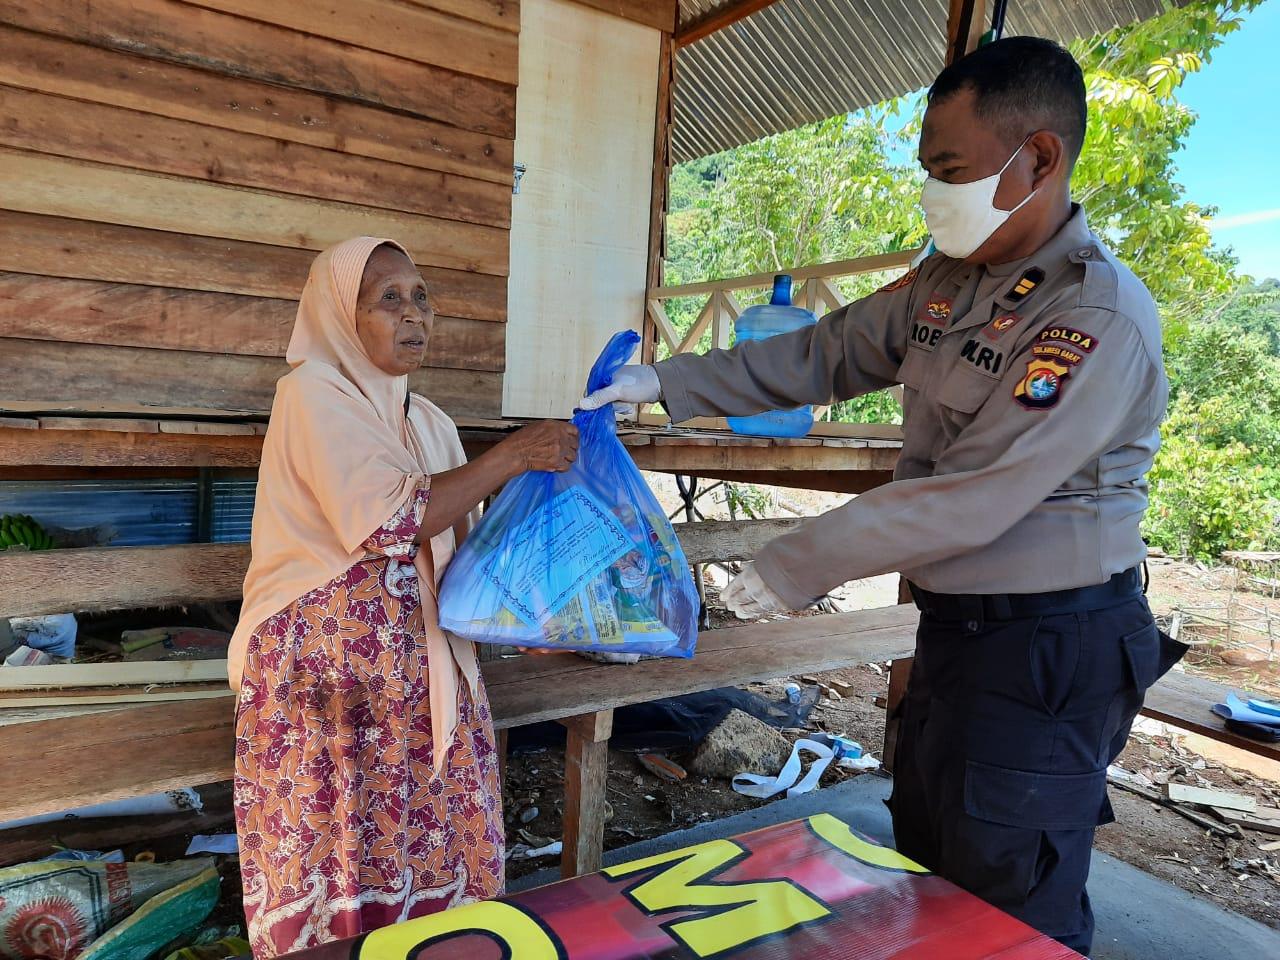 Jelang Bulan Suci Ramadhan Polda Sulbar Salurkan 2.500 Paket Sembako